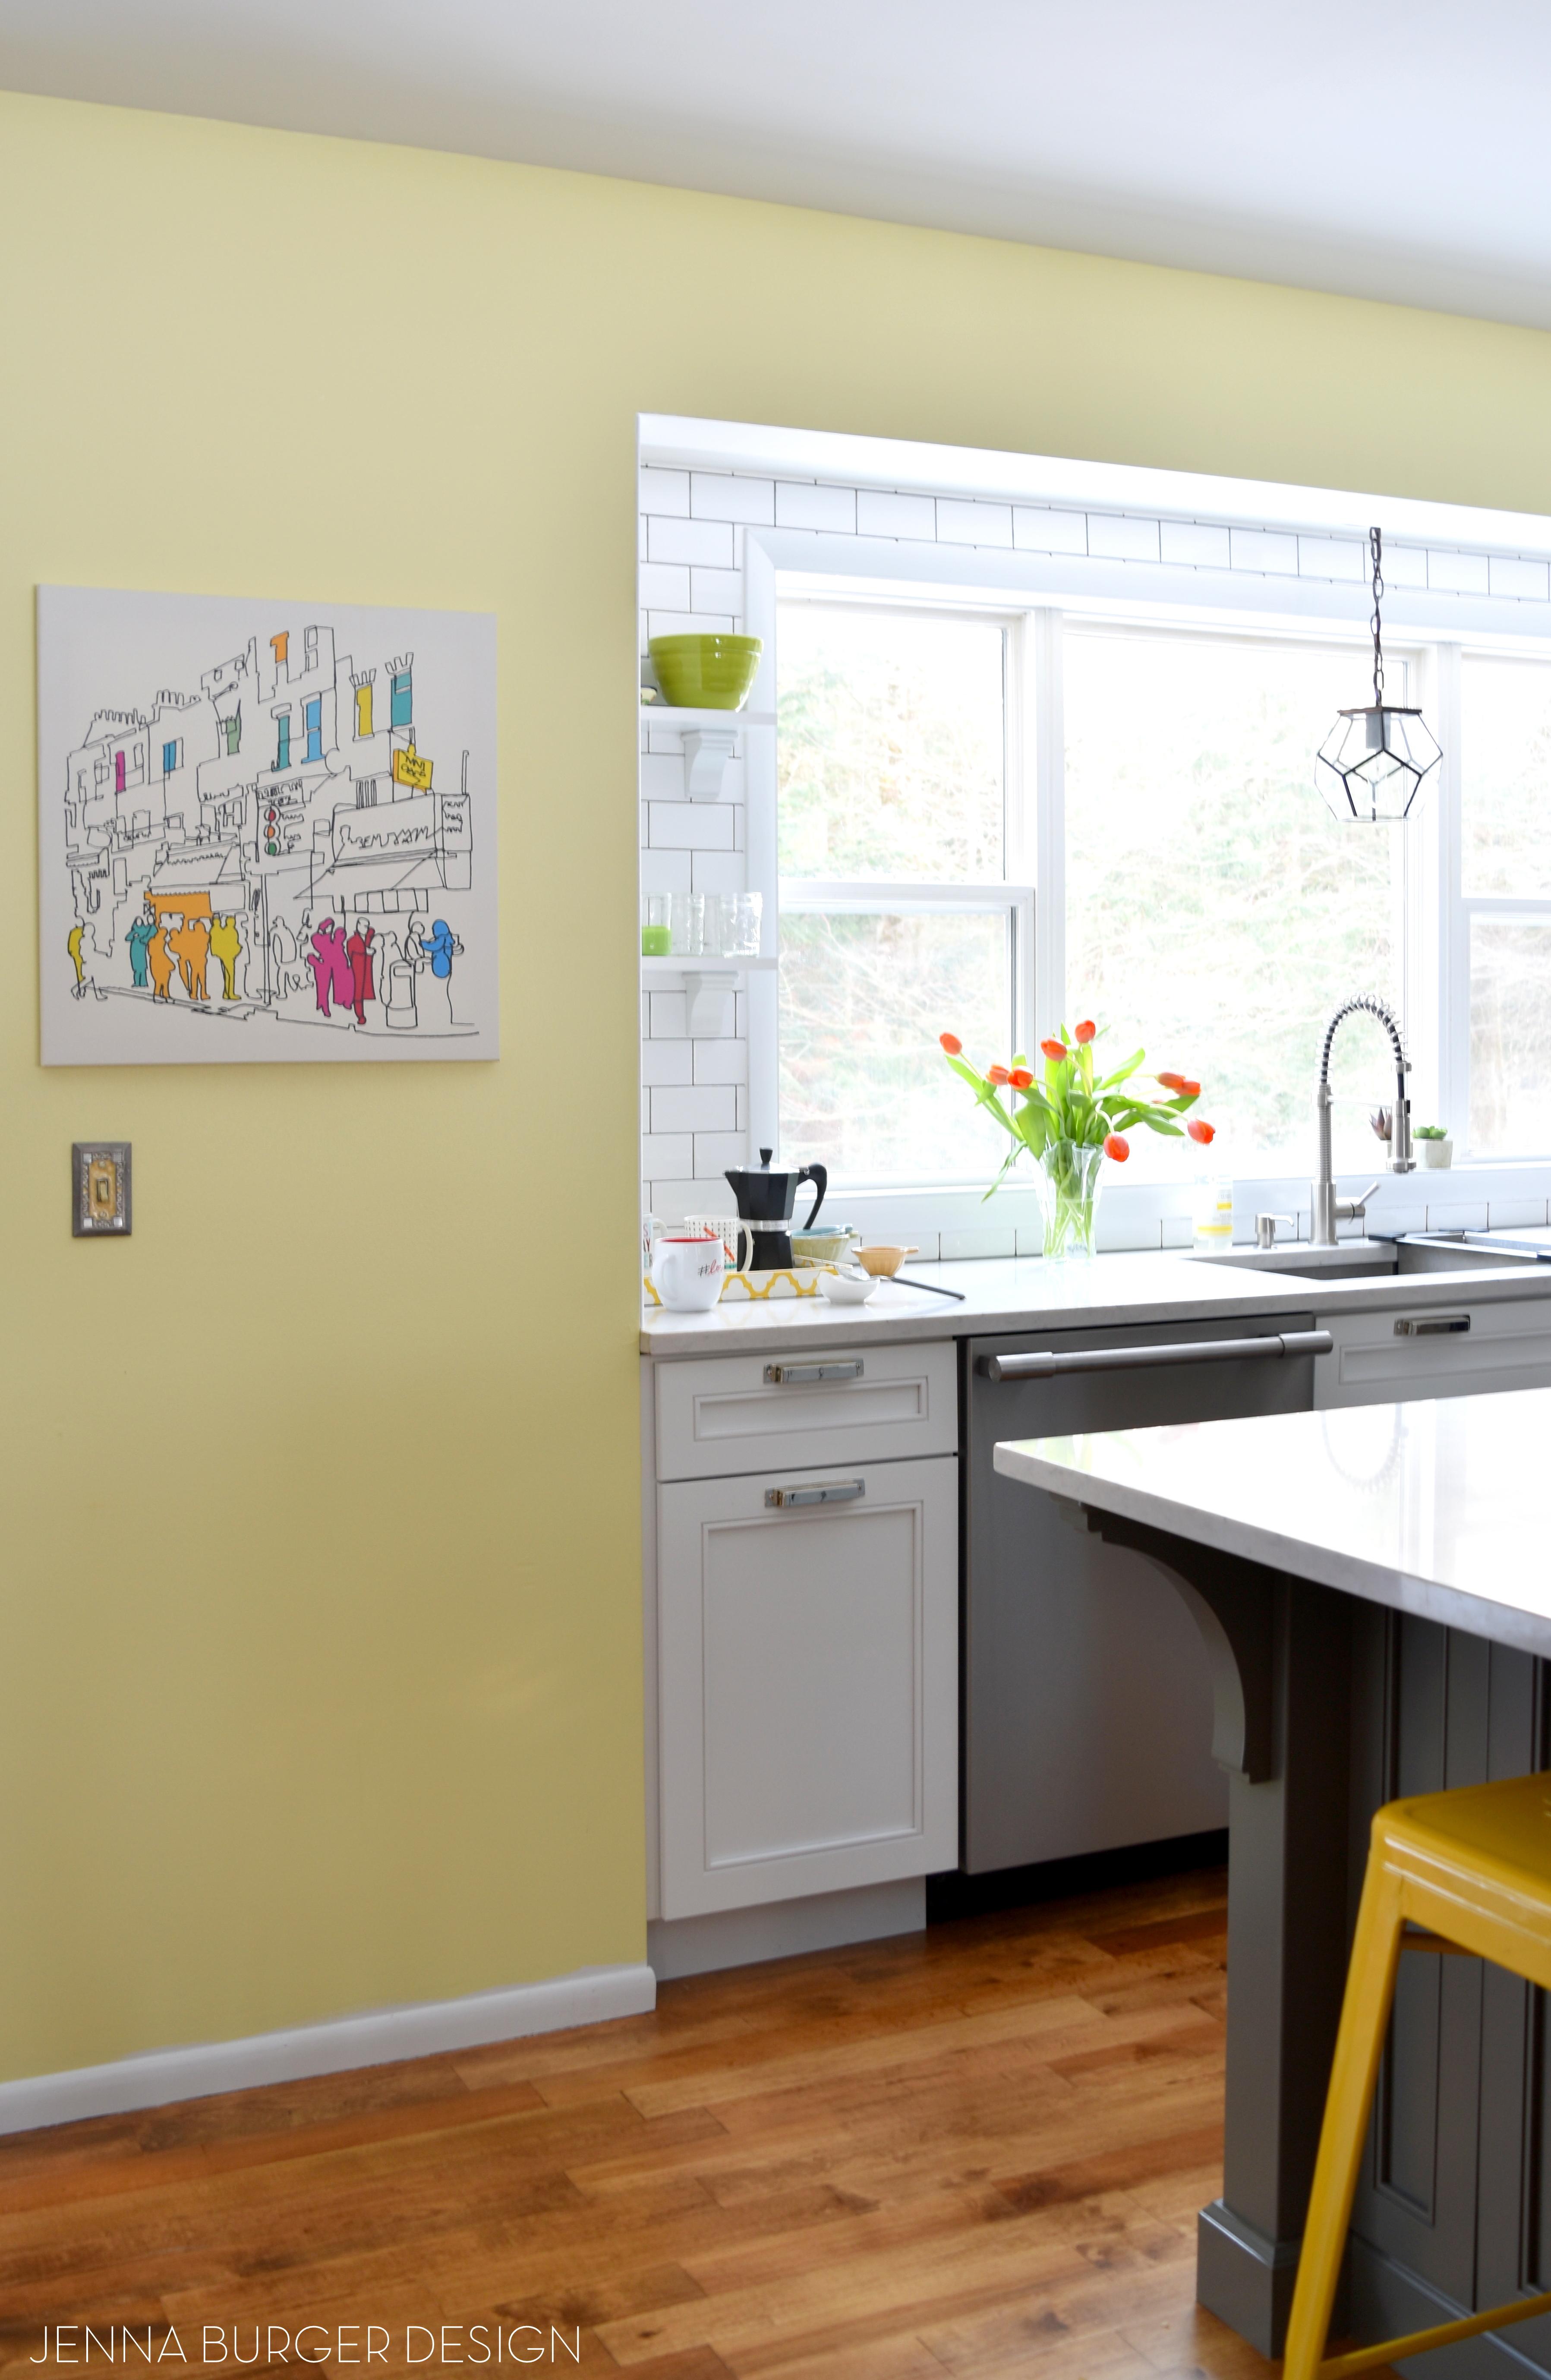 Renovation Kitchen Kitchen Renovation Reveal Resources Jenna Burger